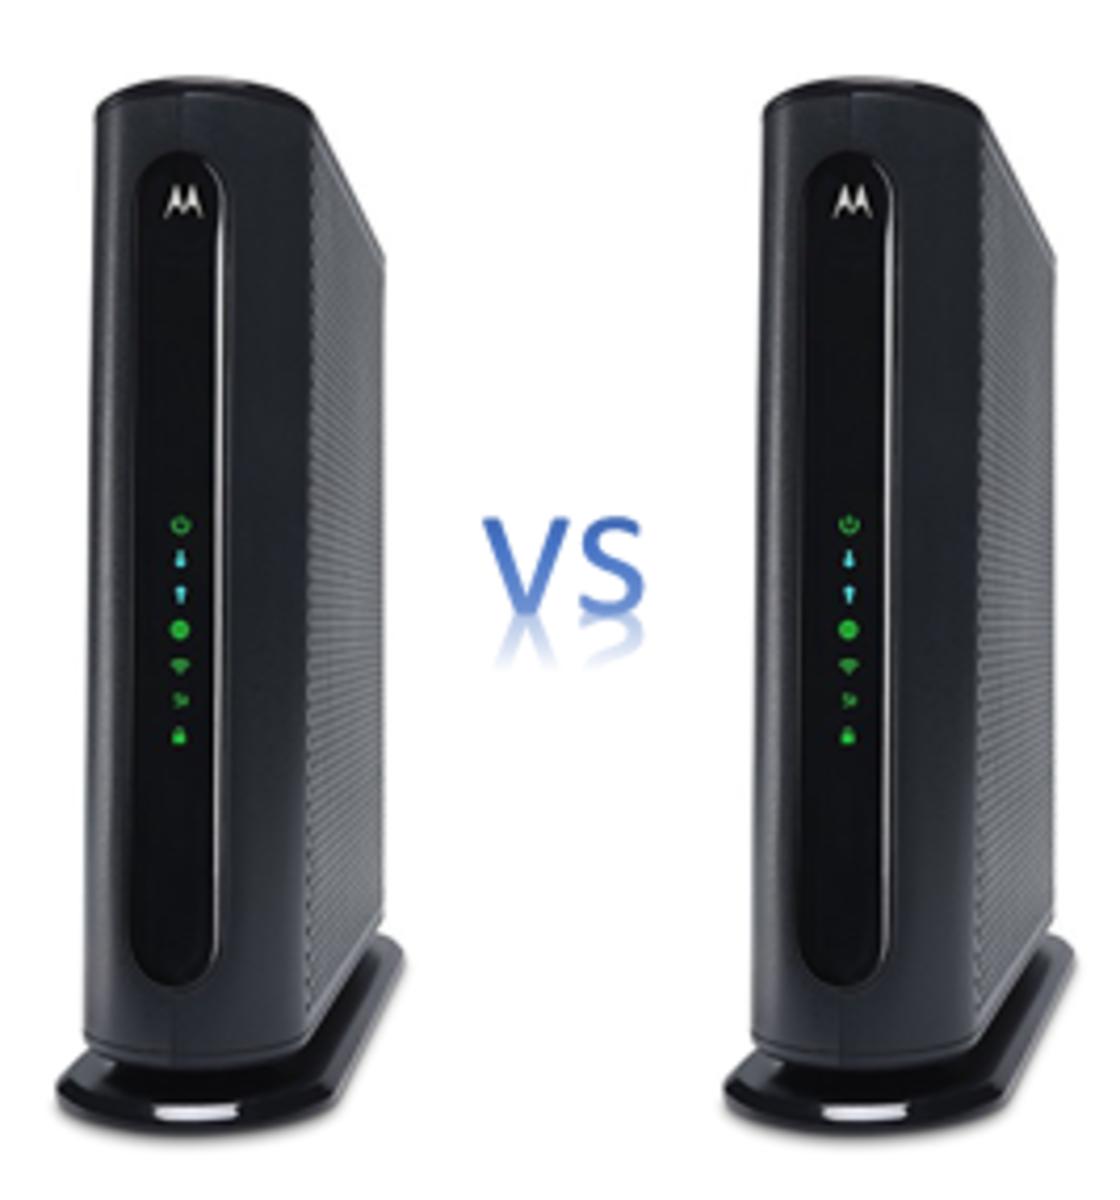 Motorola MG7450 vs MG7550. Which to buy?